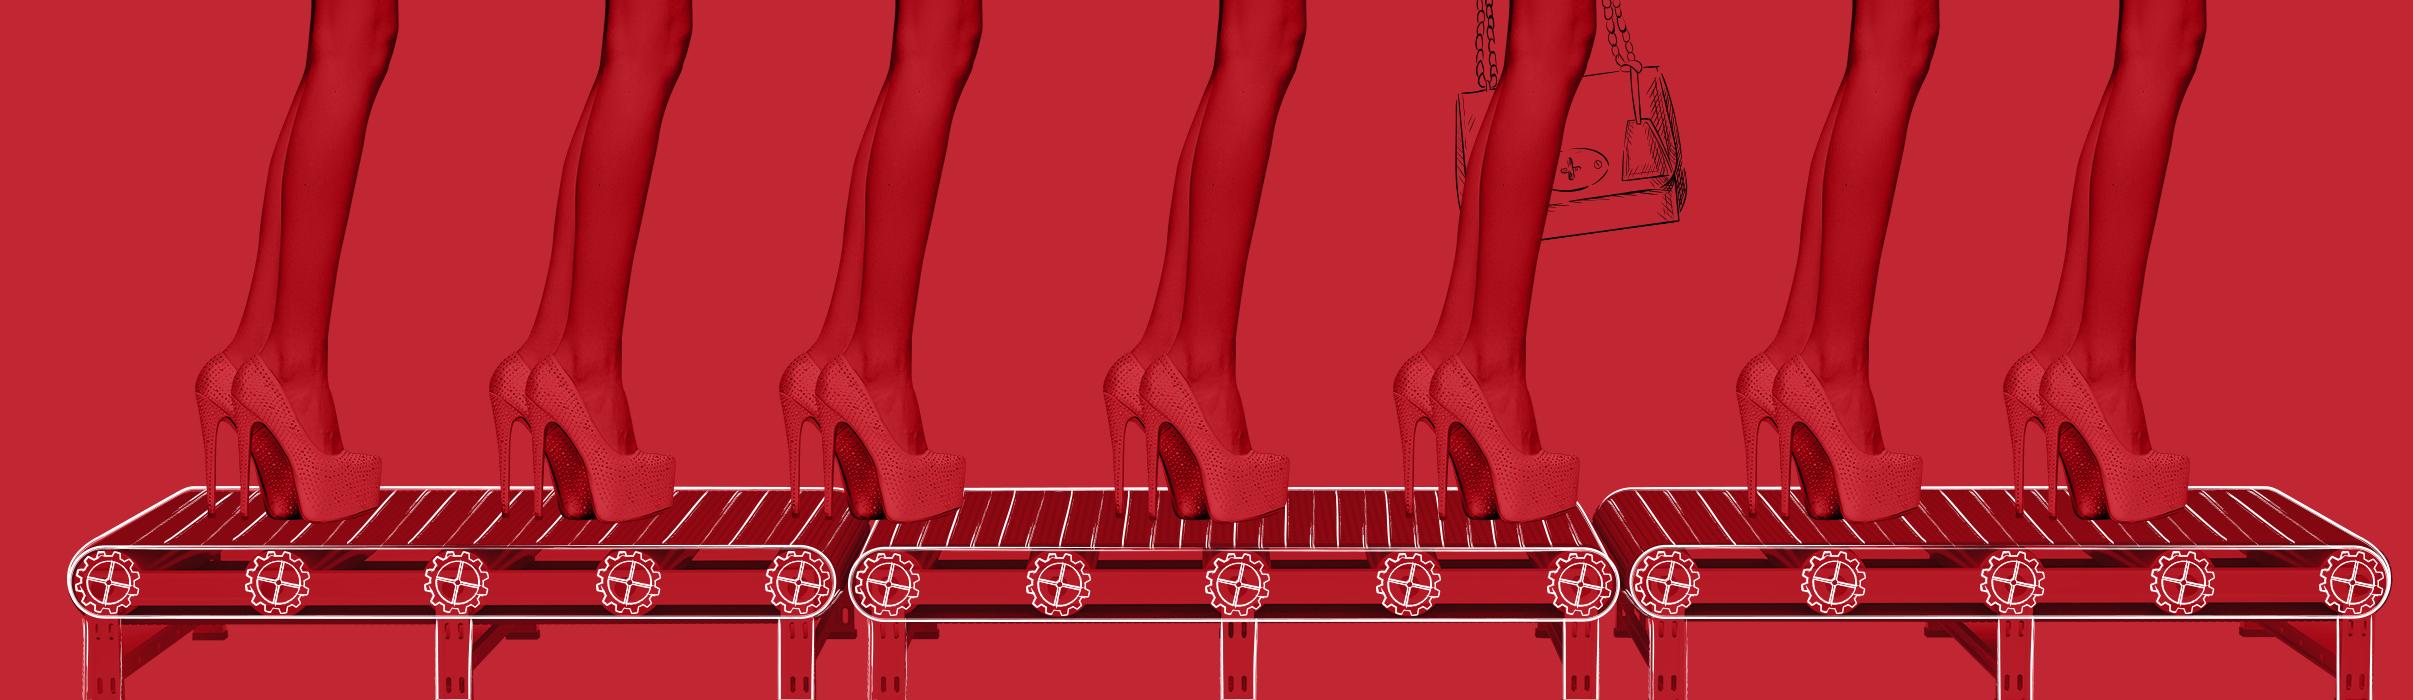 Landingpage Fashionfilm Laufband Frauenbeine Pumps